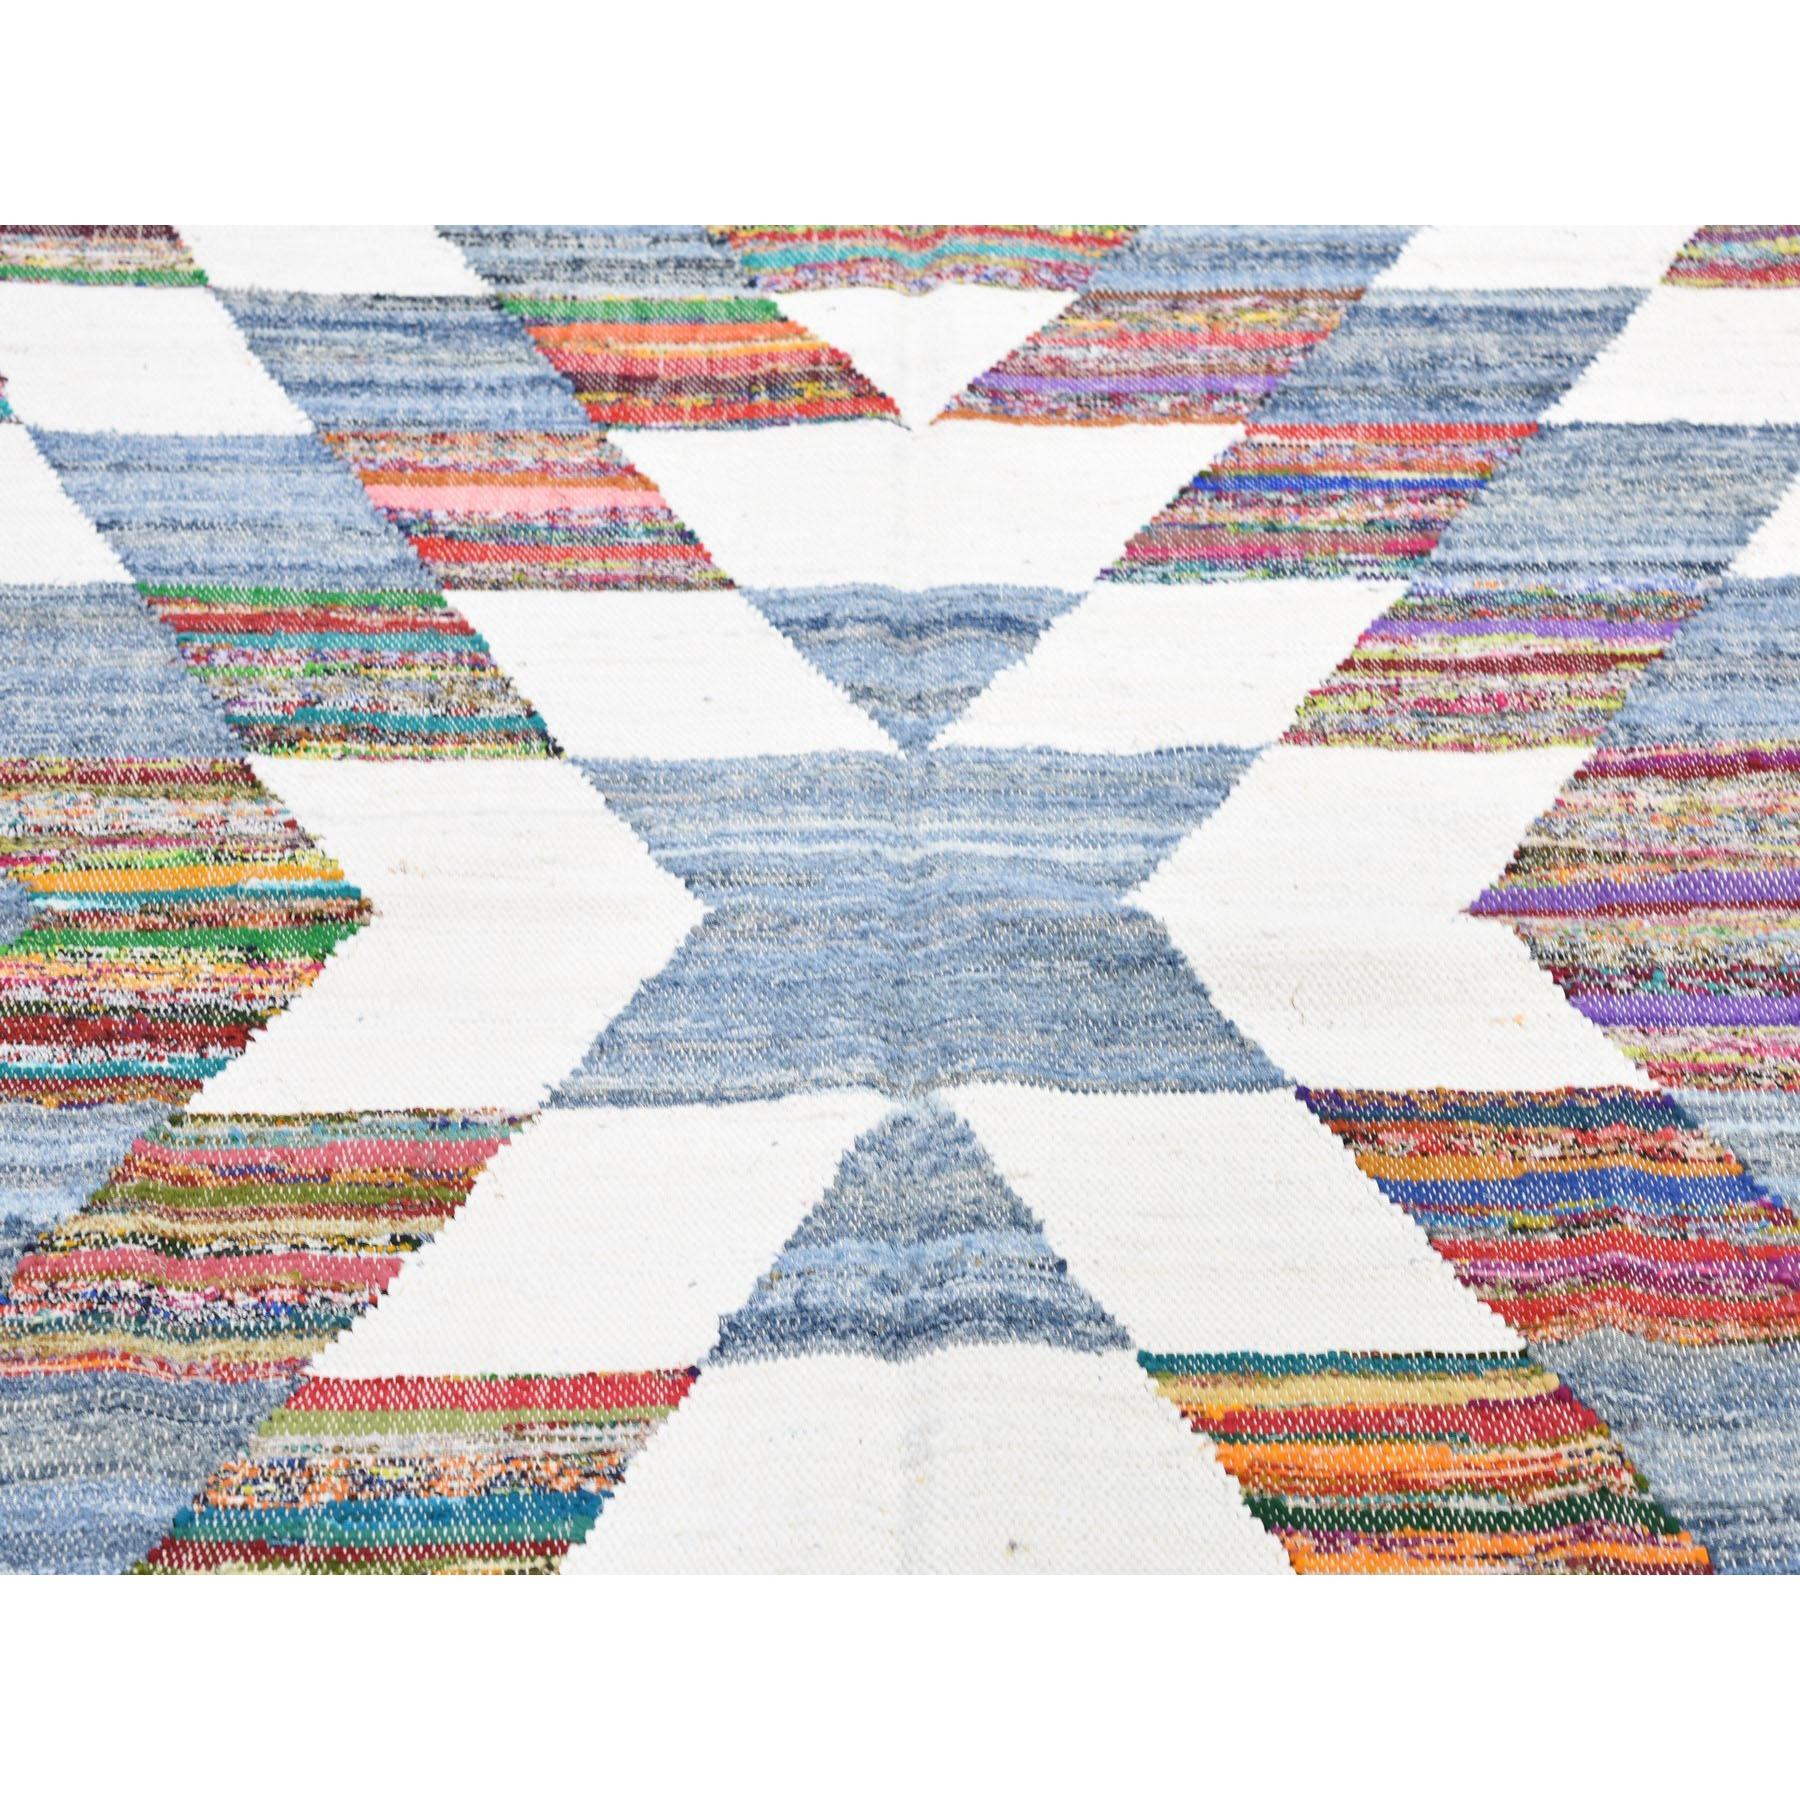 9-8 x14- Hand-Woven Geometric Cotton And Sari Silk Durie Kilim Oriental Rug